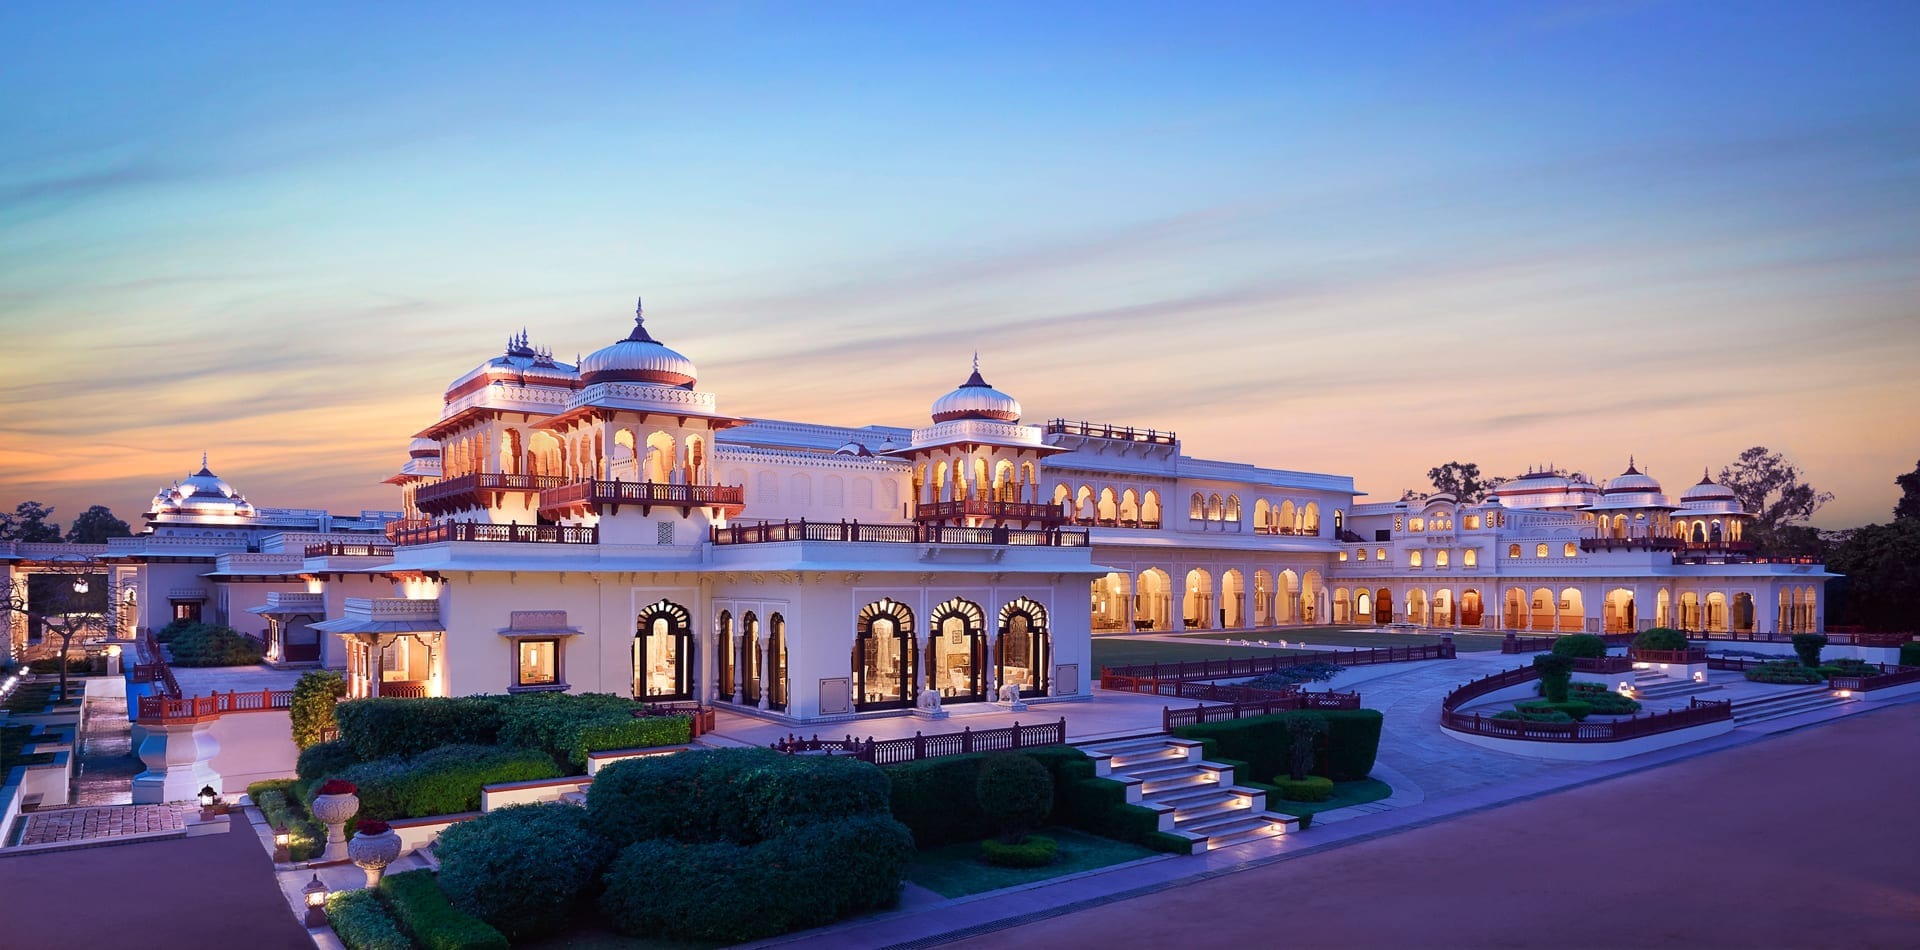 Rambagh Palace Exterior at Dusk in India